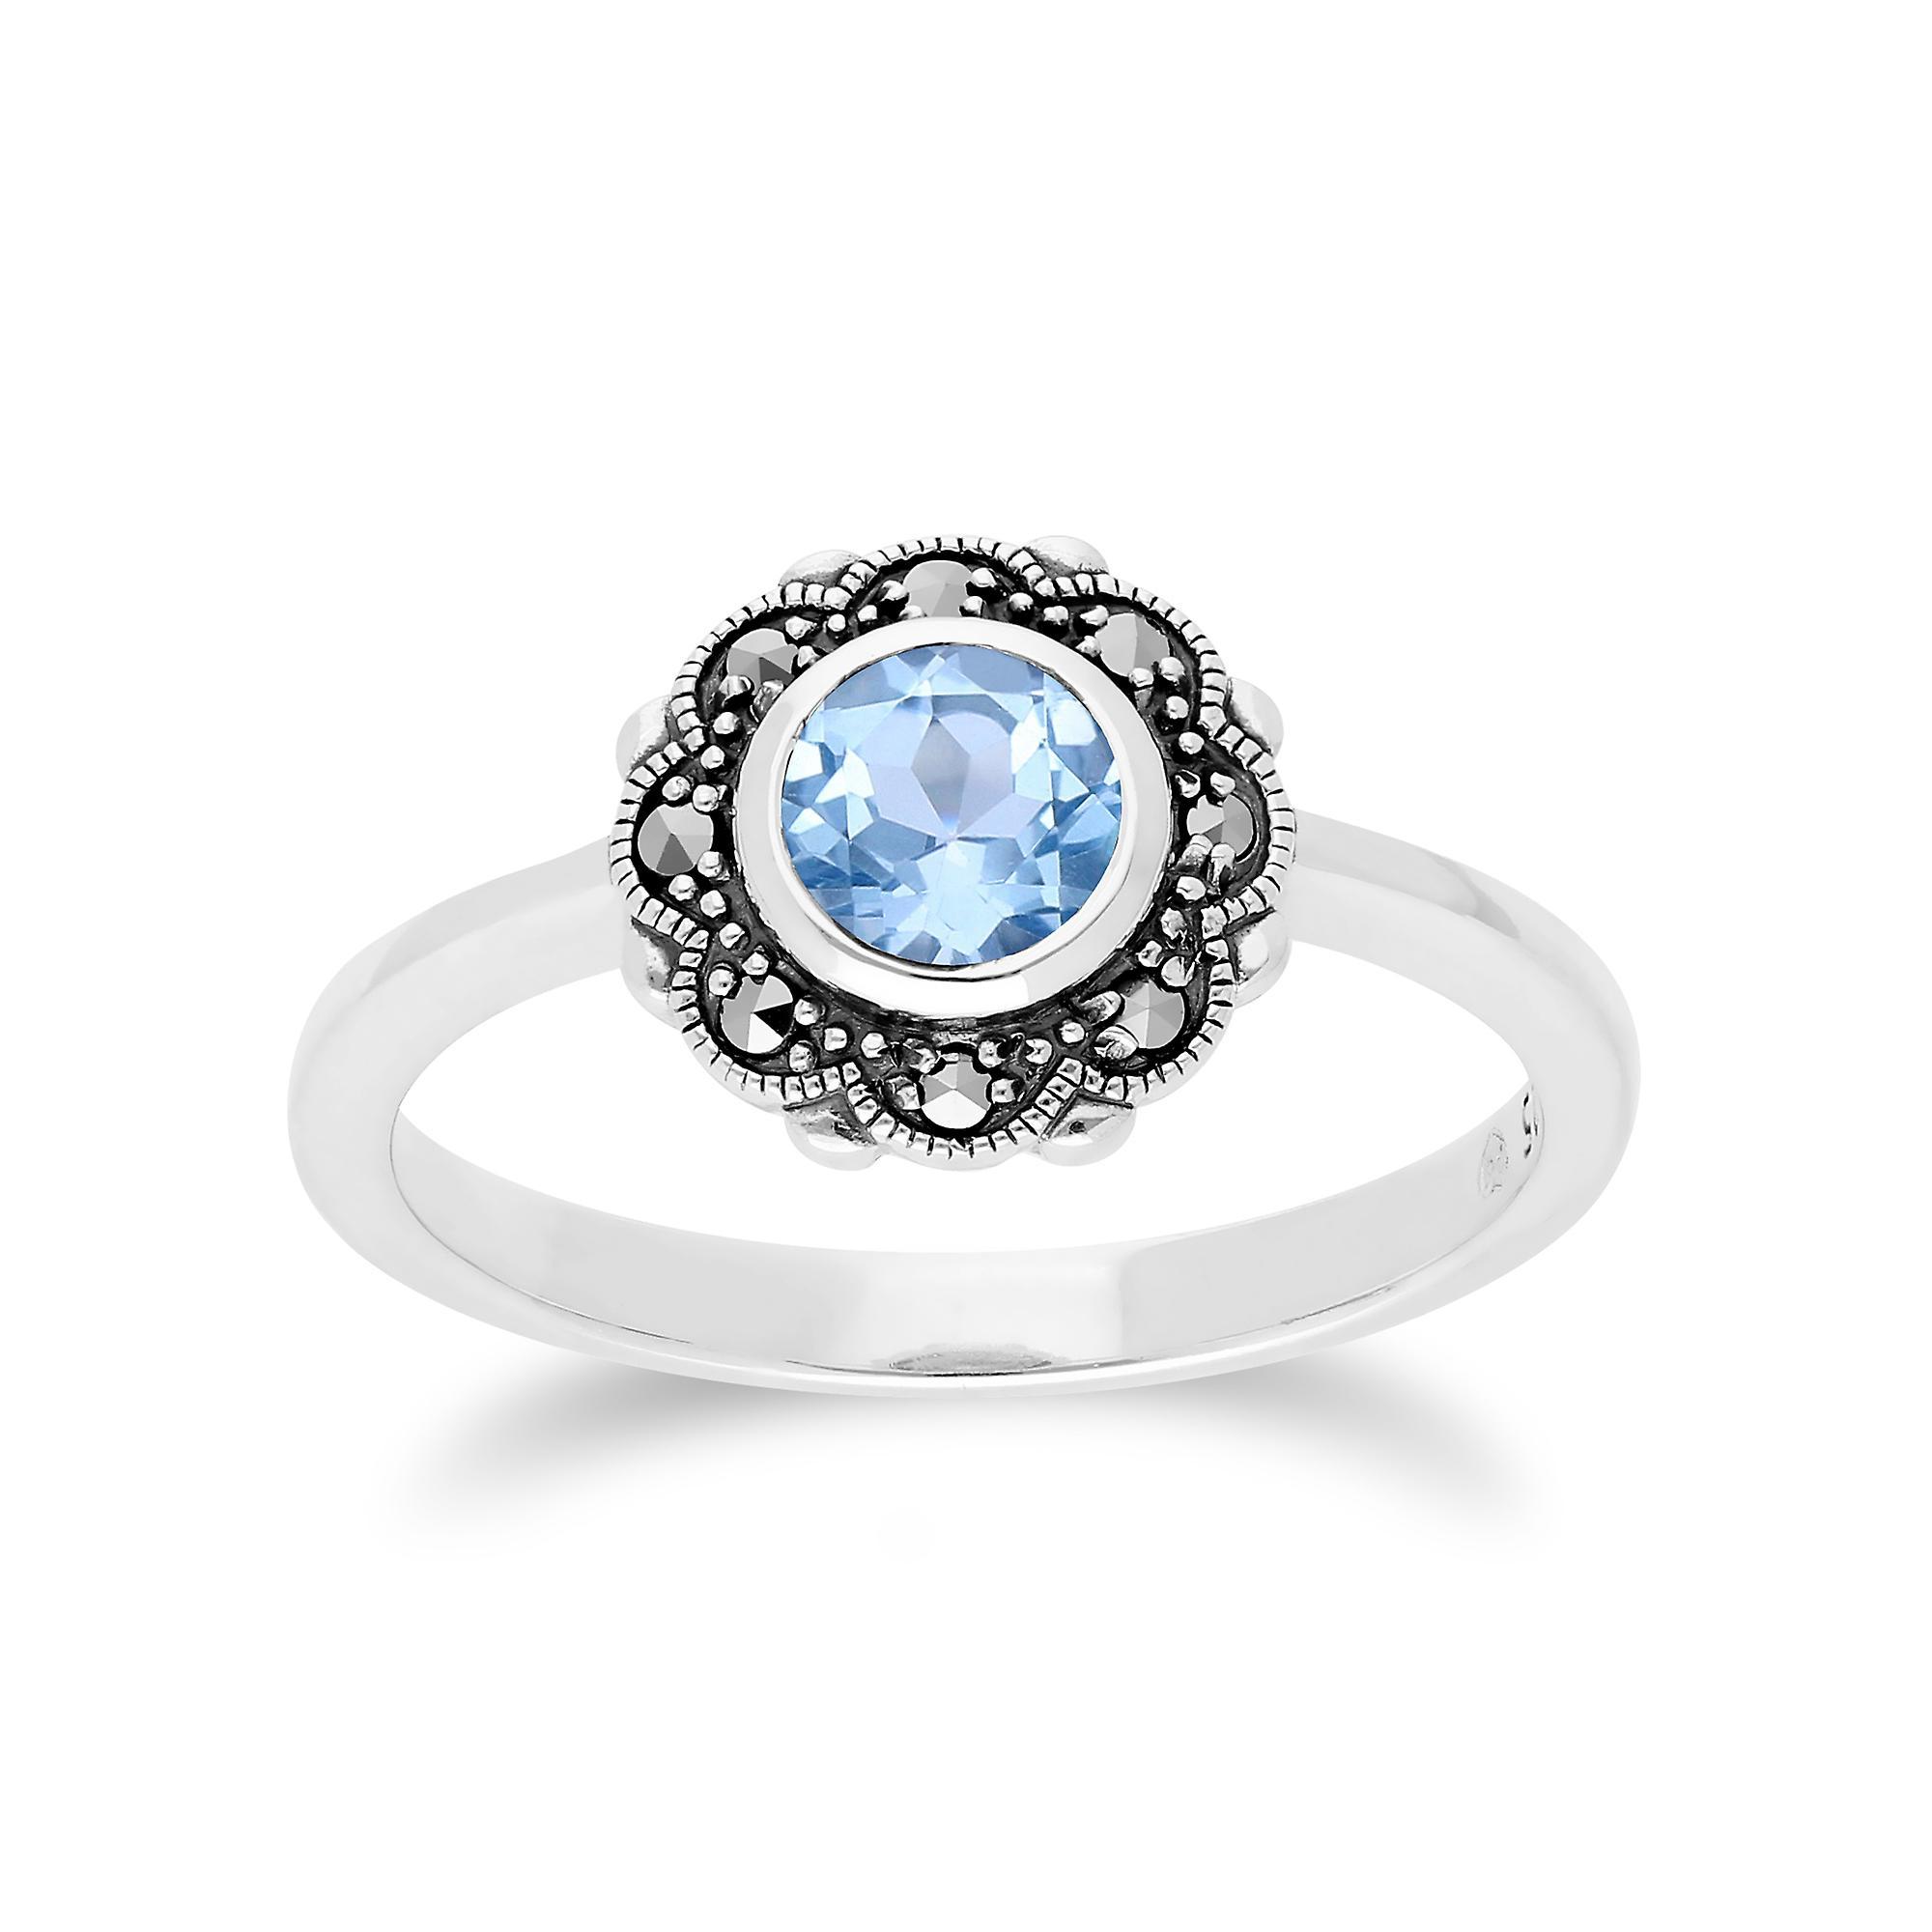 Gemondo Sterling Silver Blue Topaz & Marcasite Art Noveau Floral Ring